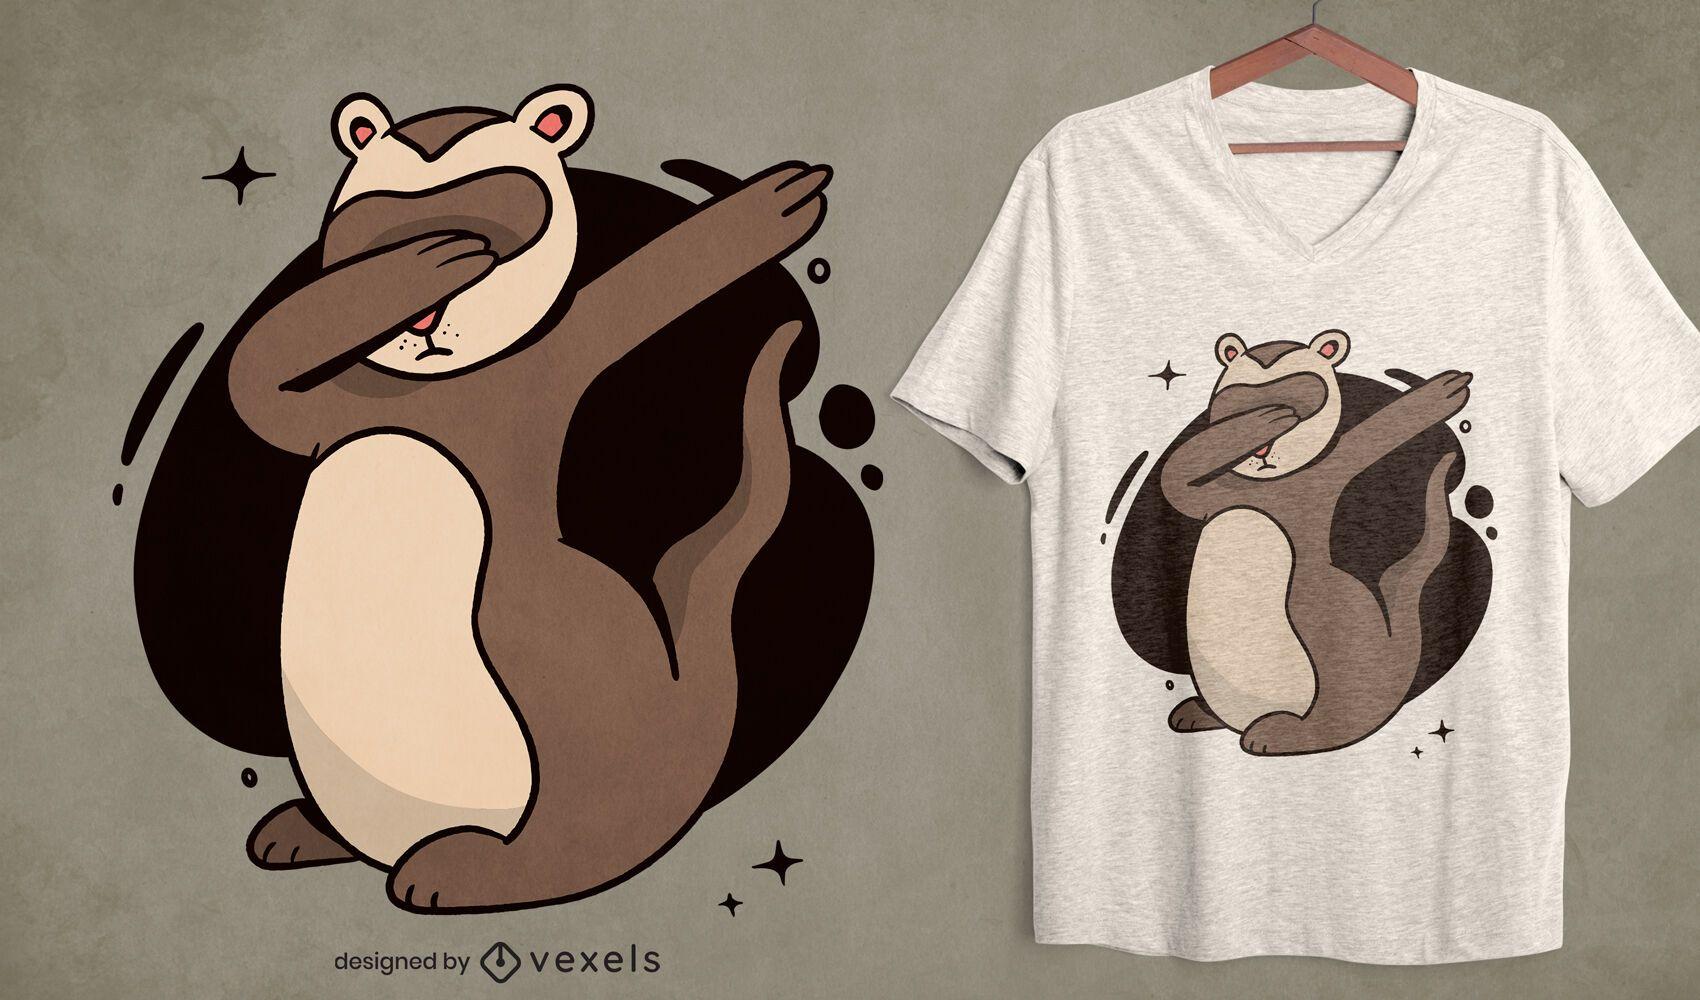 Dabbing ferret t-shirt design